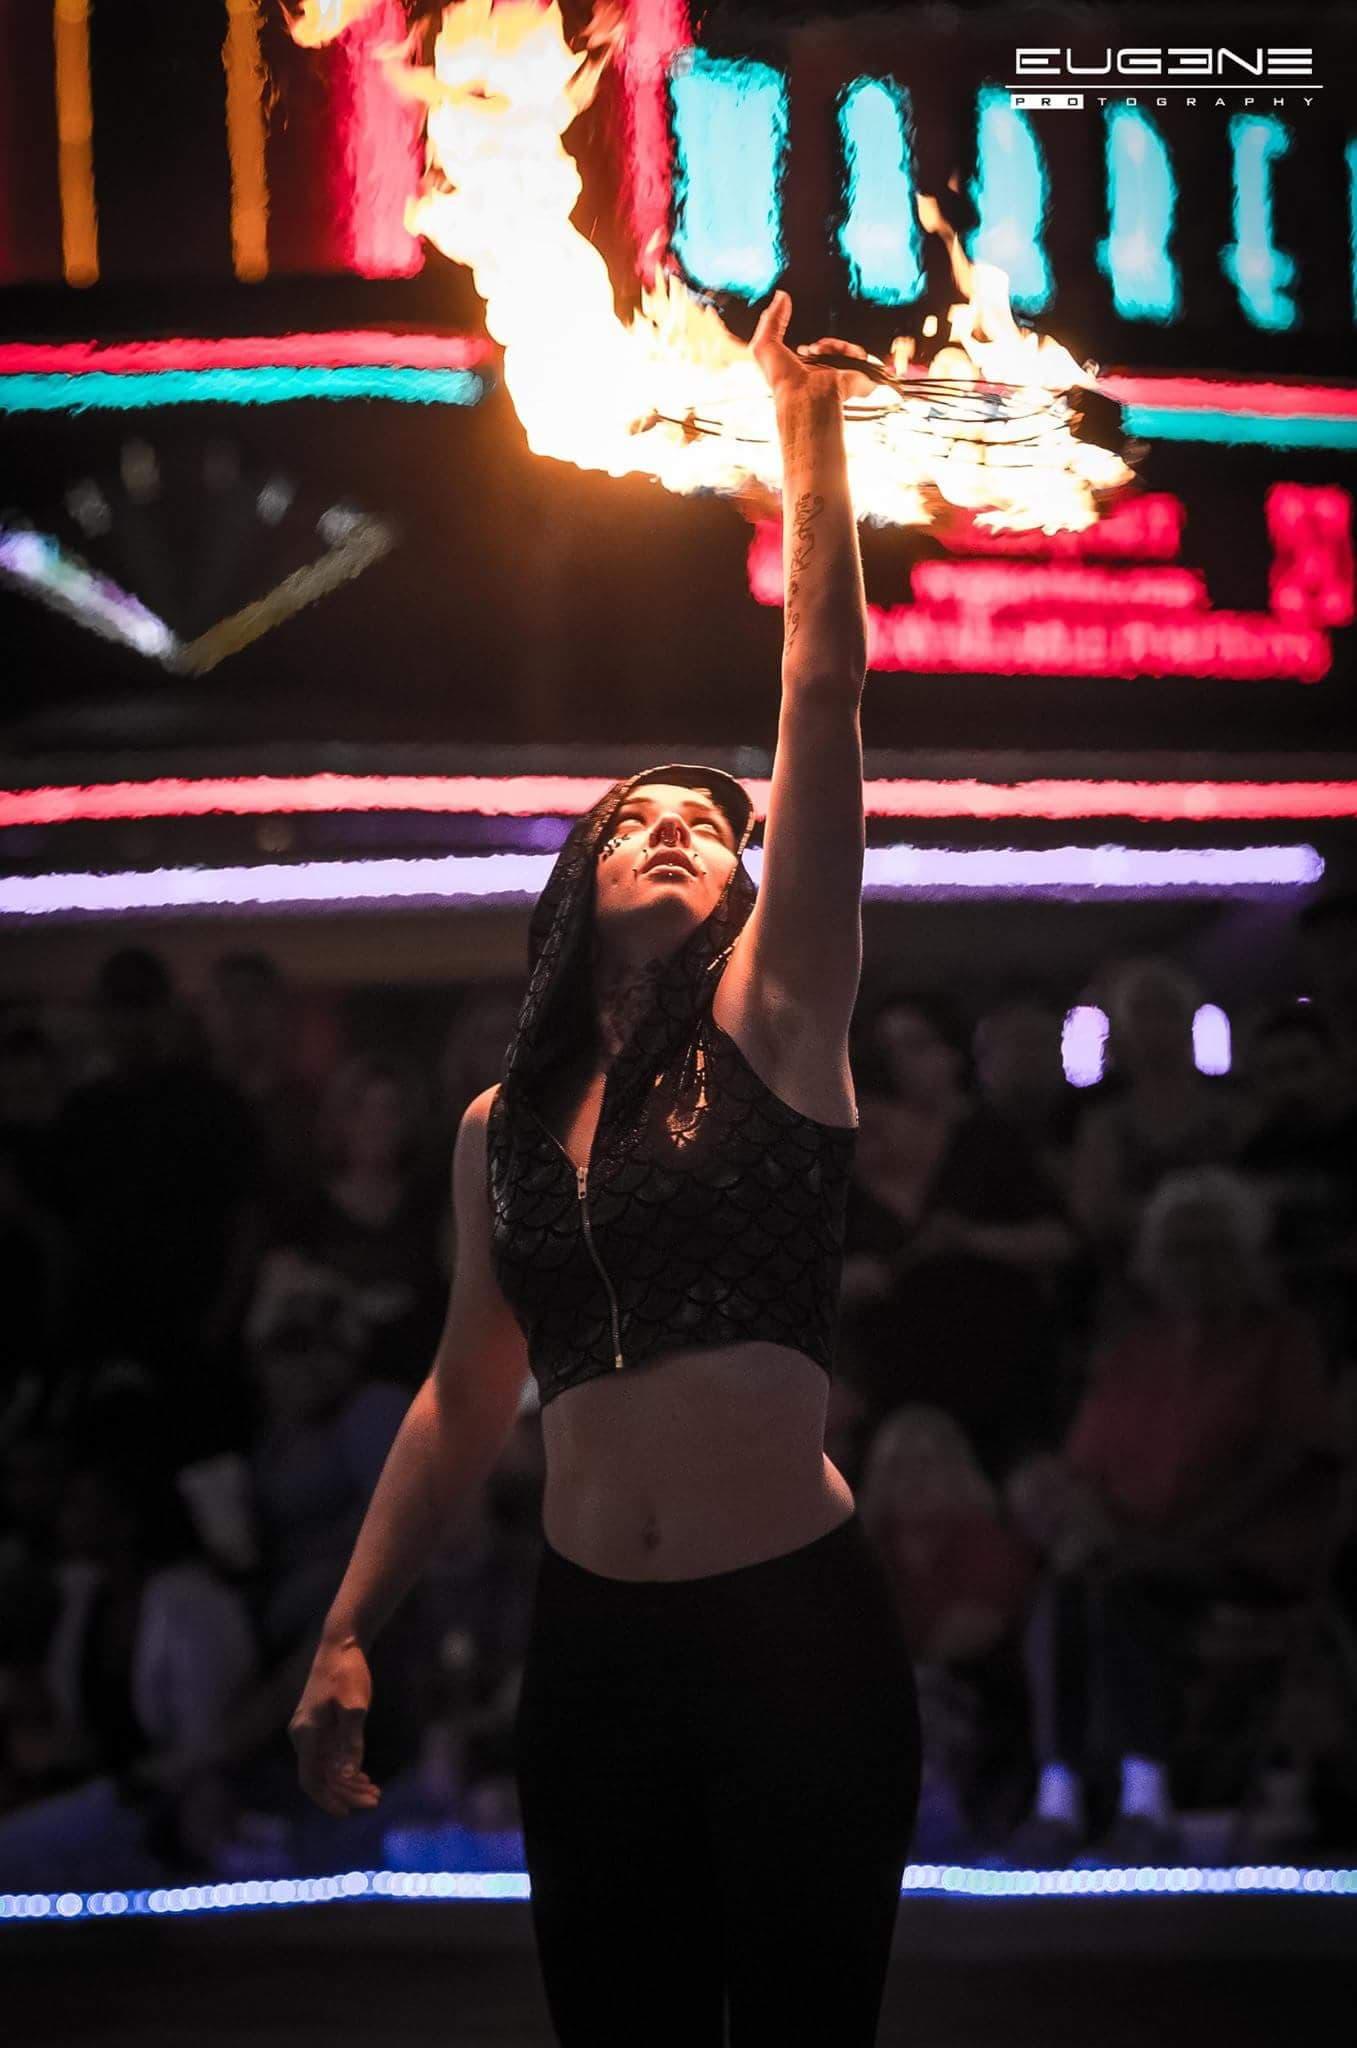 Wichita Fire Dancer Madison Flamewater Cicus